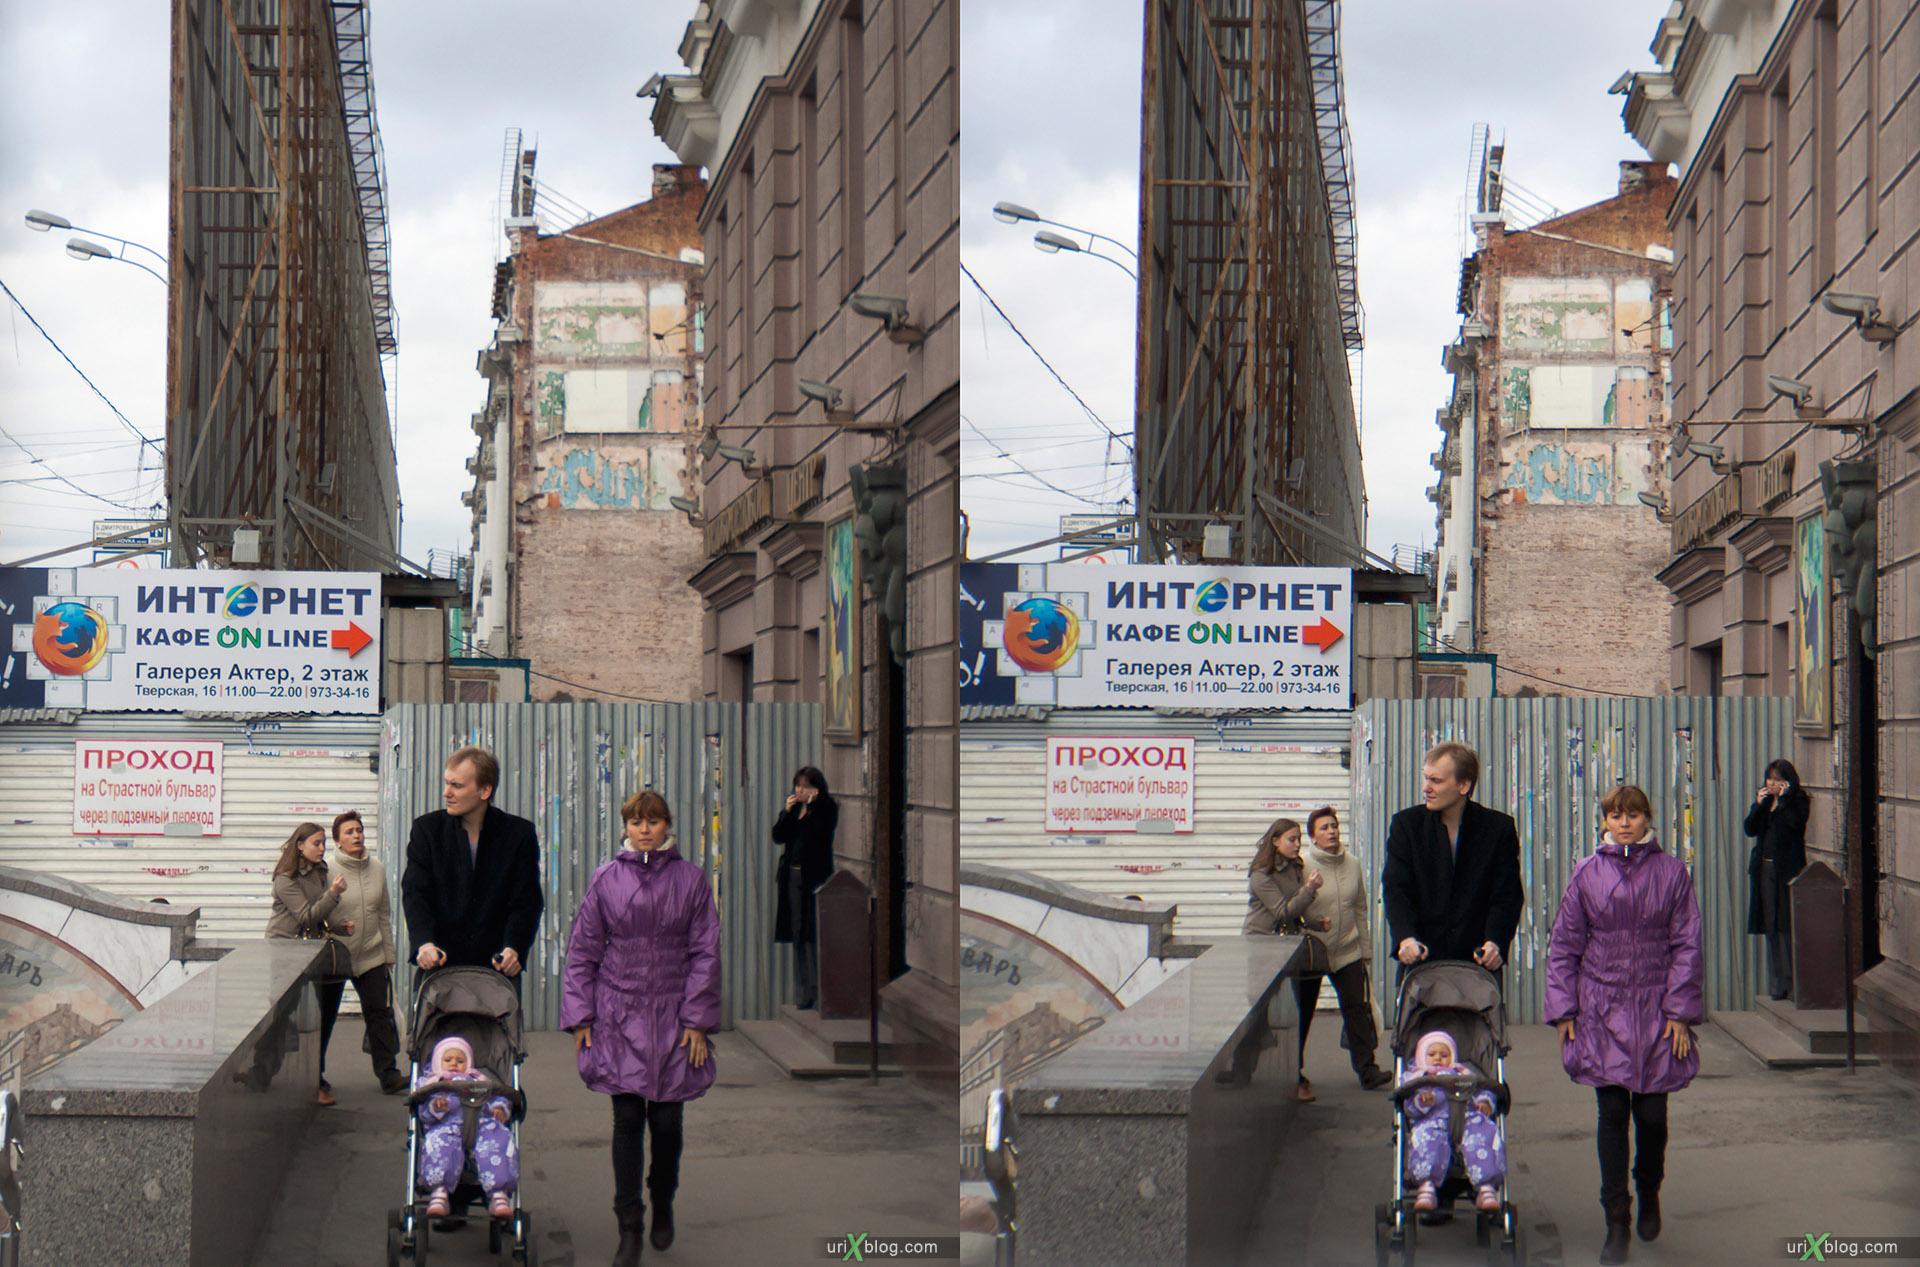 2011 Moscow, 3D, stereo, cross-eyed, стерео, стереопара, Москва, Loreo 3D lens in a cap